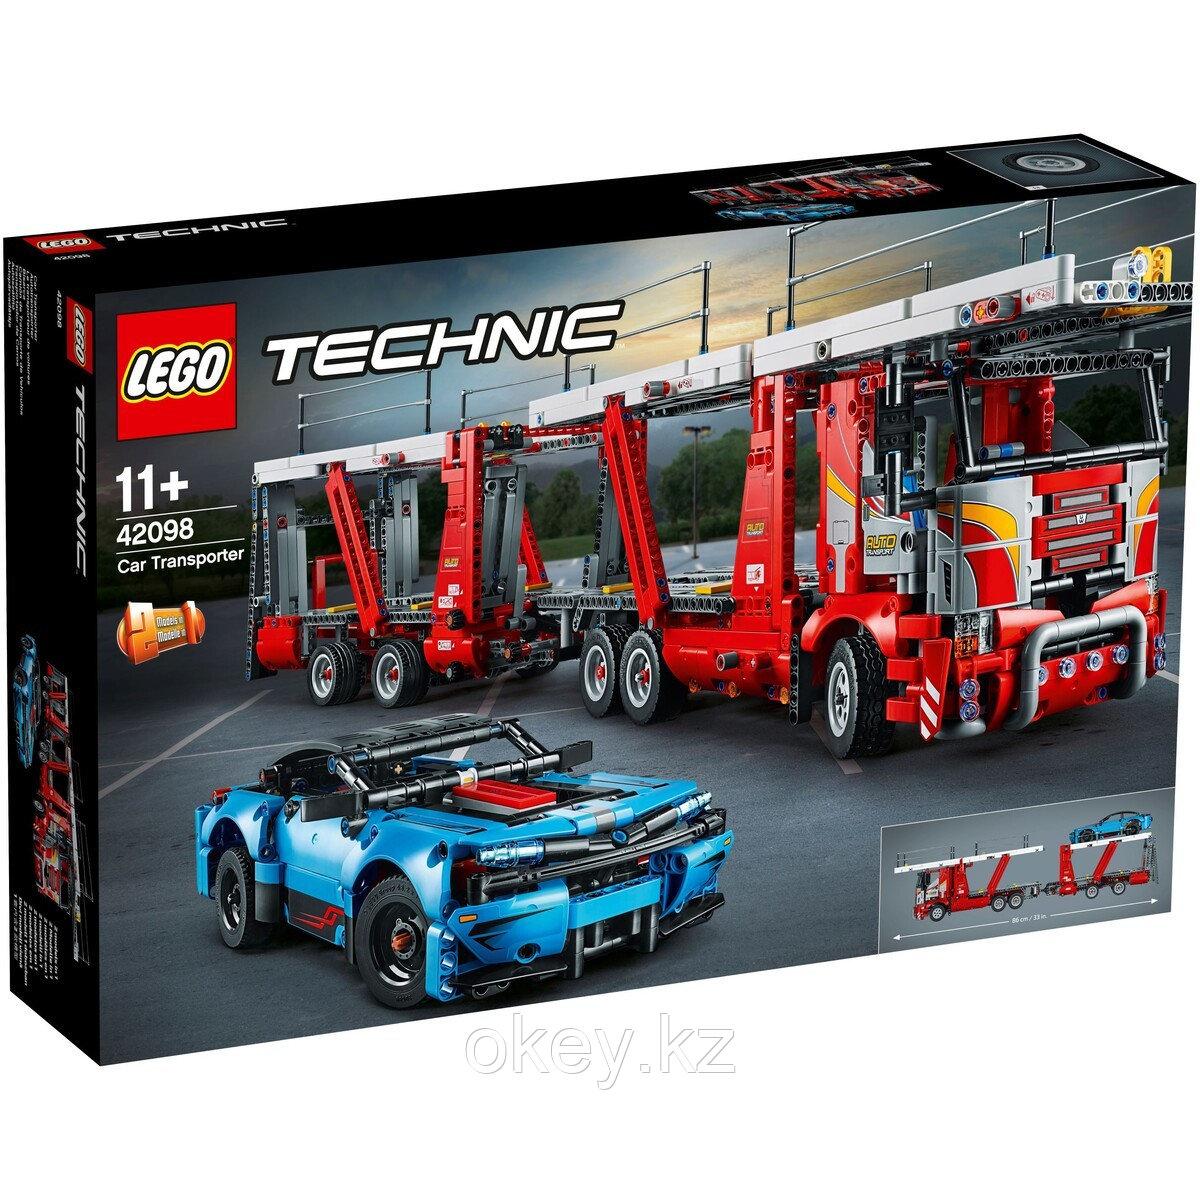 LEGO Technic: Автовоз 42098